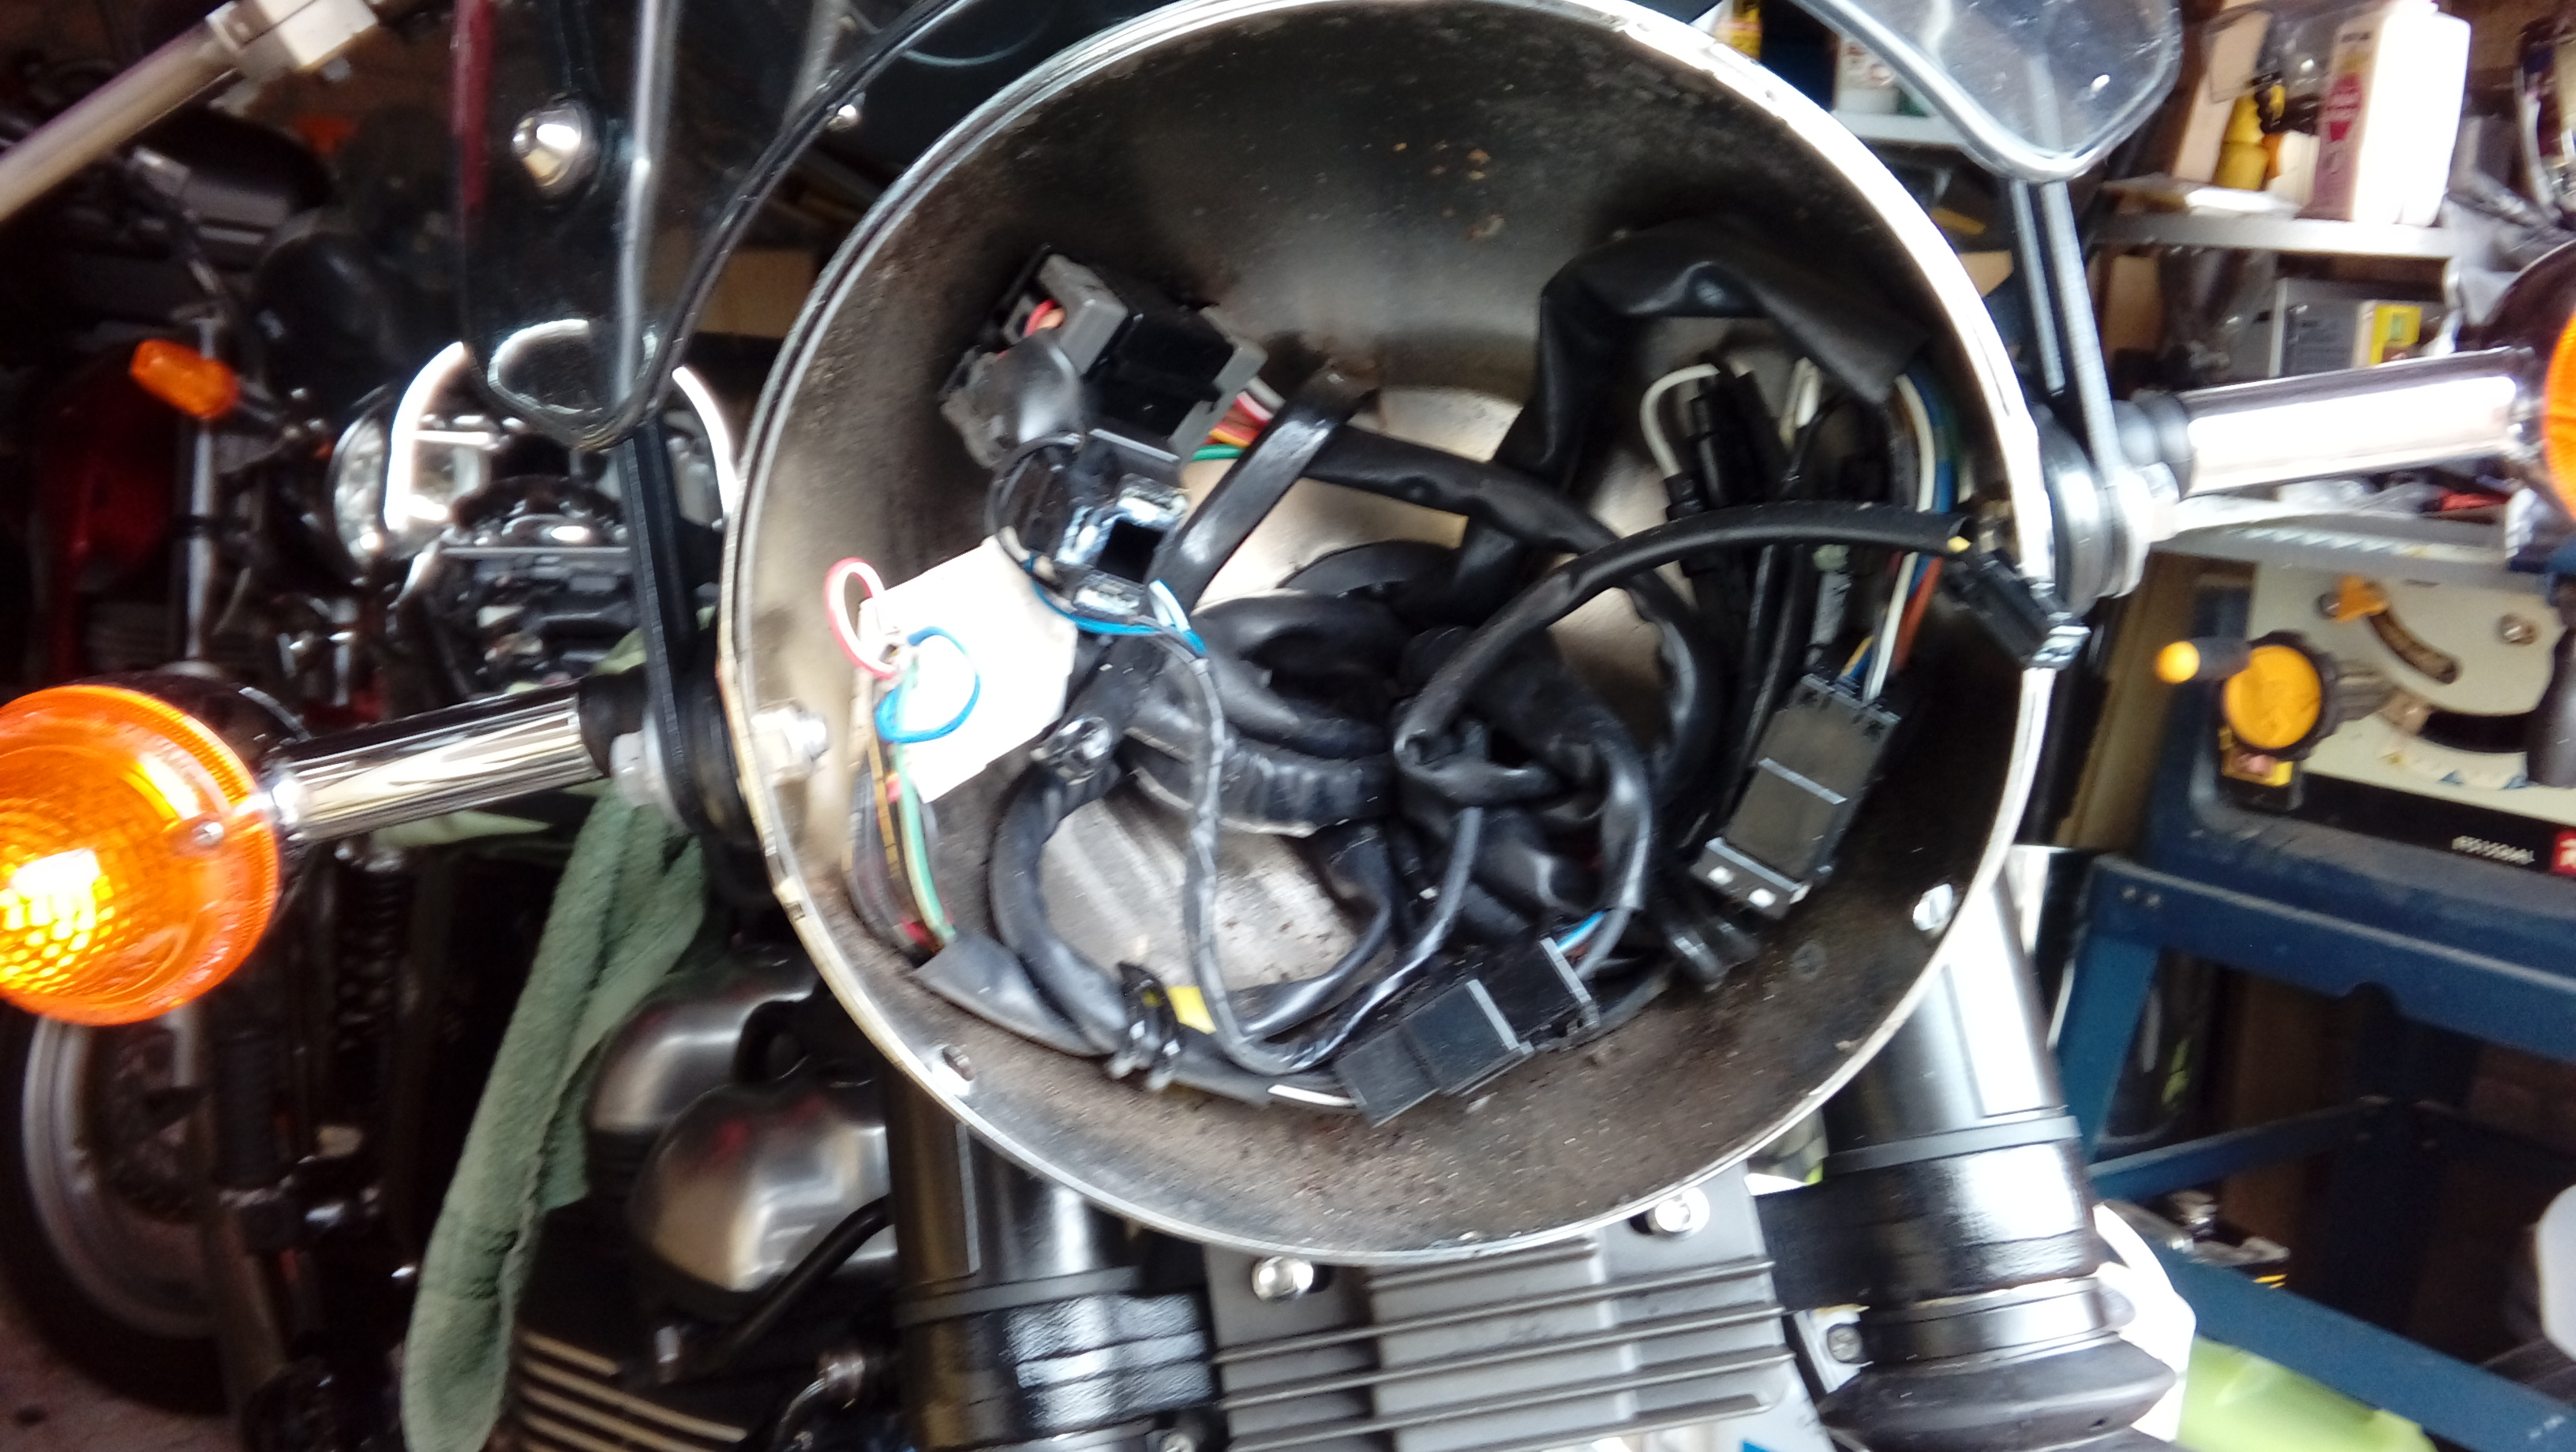 New T100 Bonnie Fluctuating Speedo Triumph Forum